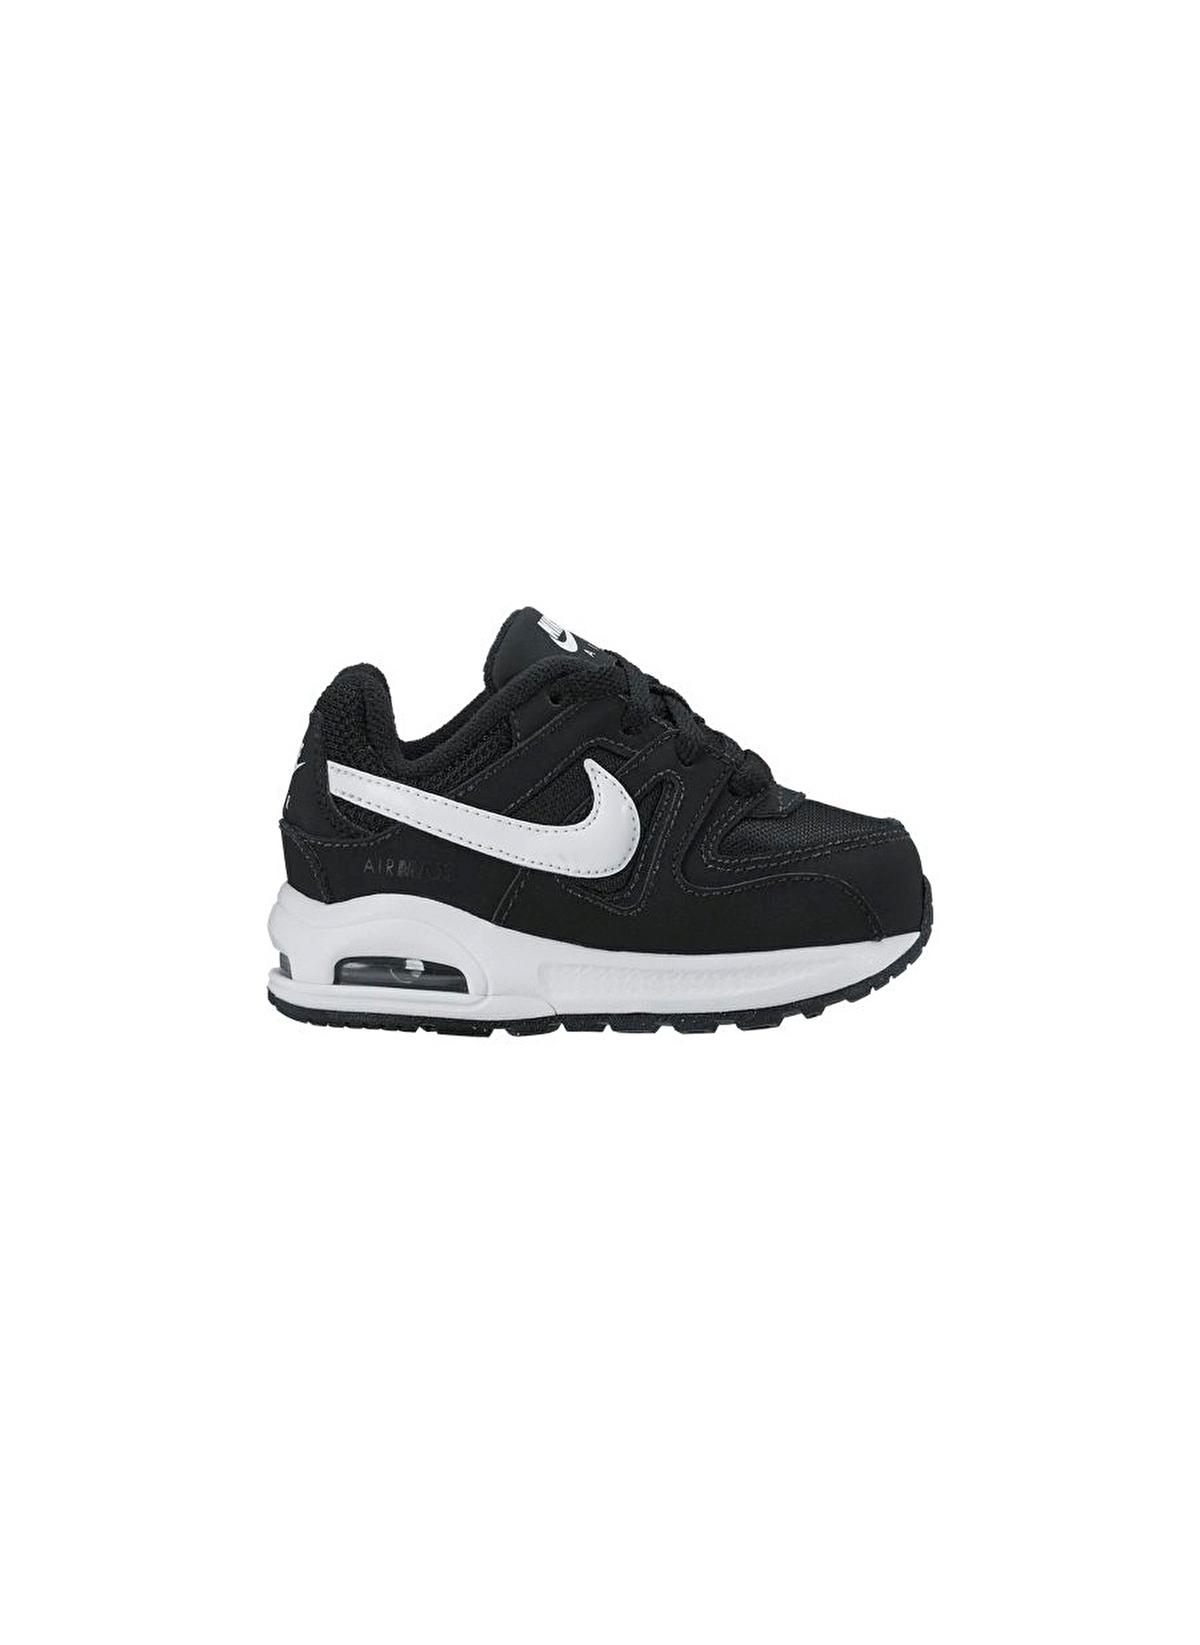 1302241a38b5c Nike Erkek Bebek Nike Air Max Command Flex Black/Whıte-Whıte ...